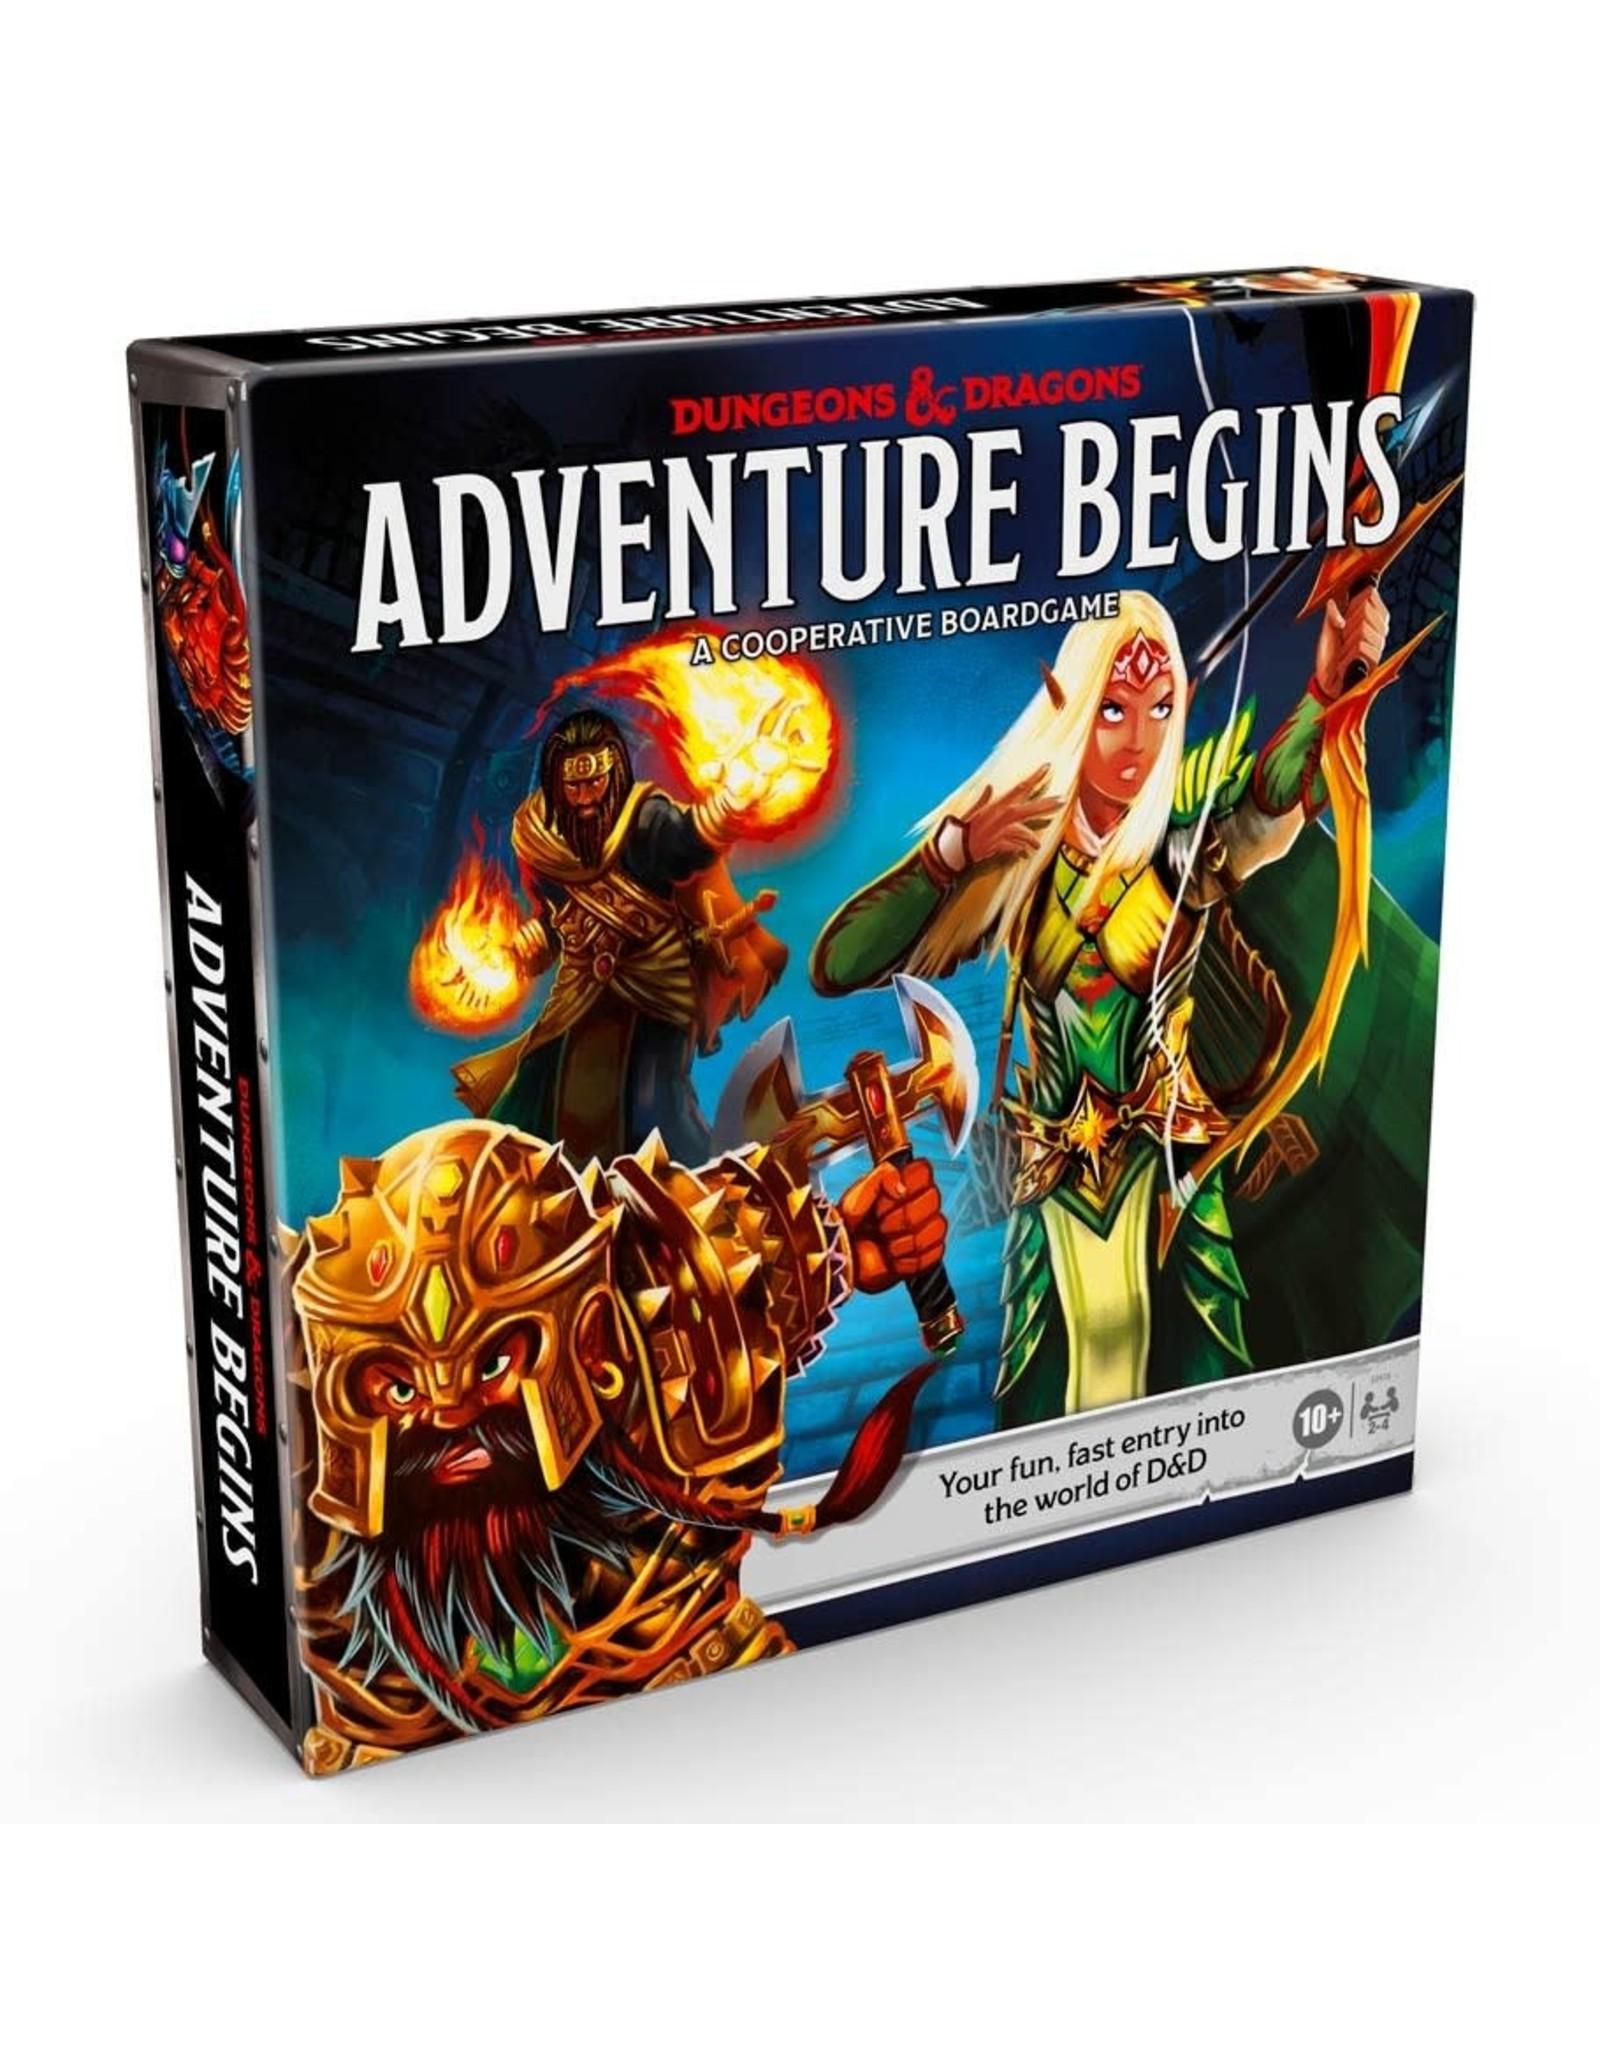 Dungeons & Dragons Dungeons & Dragons: Adventure Begins